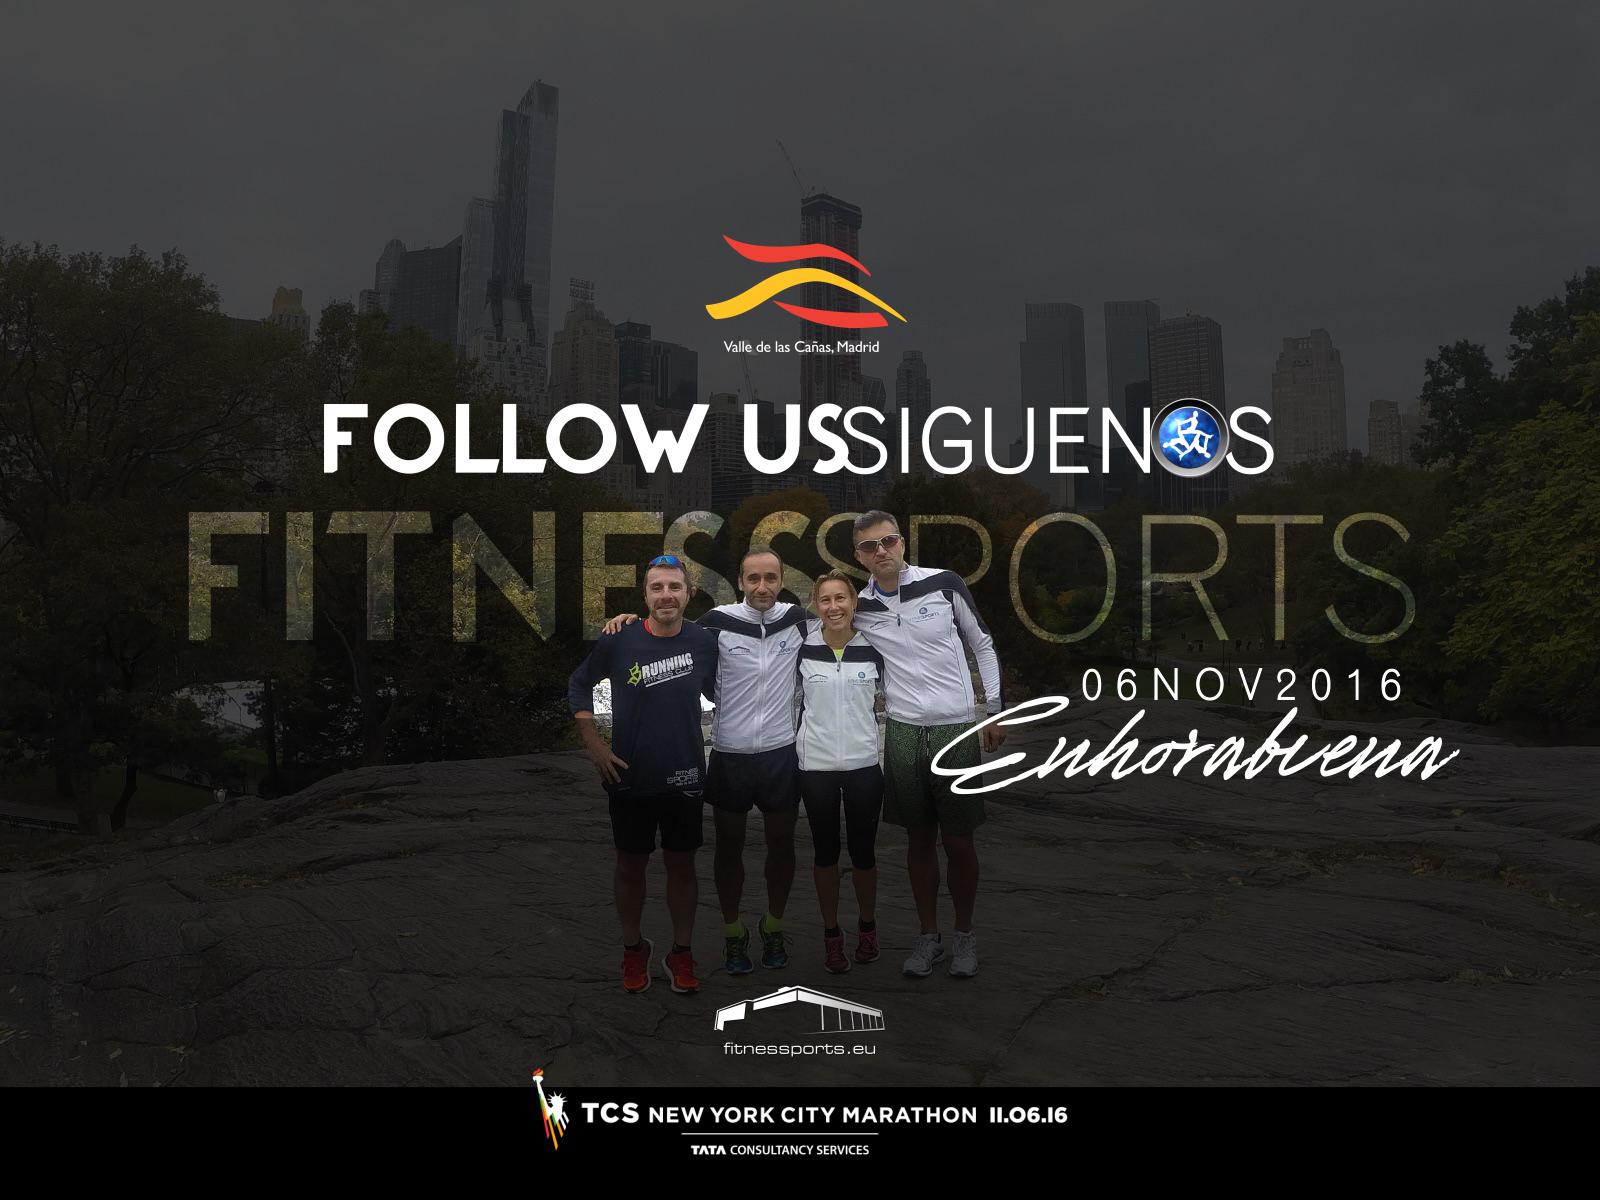 tcs-new-york-city-marathon-2016-fitness-sports-valle-las-canas-enhorabuena